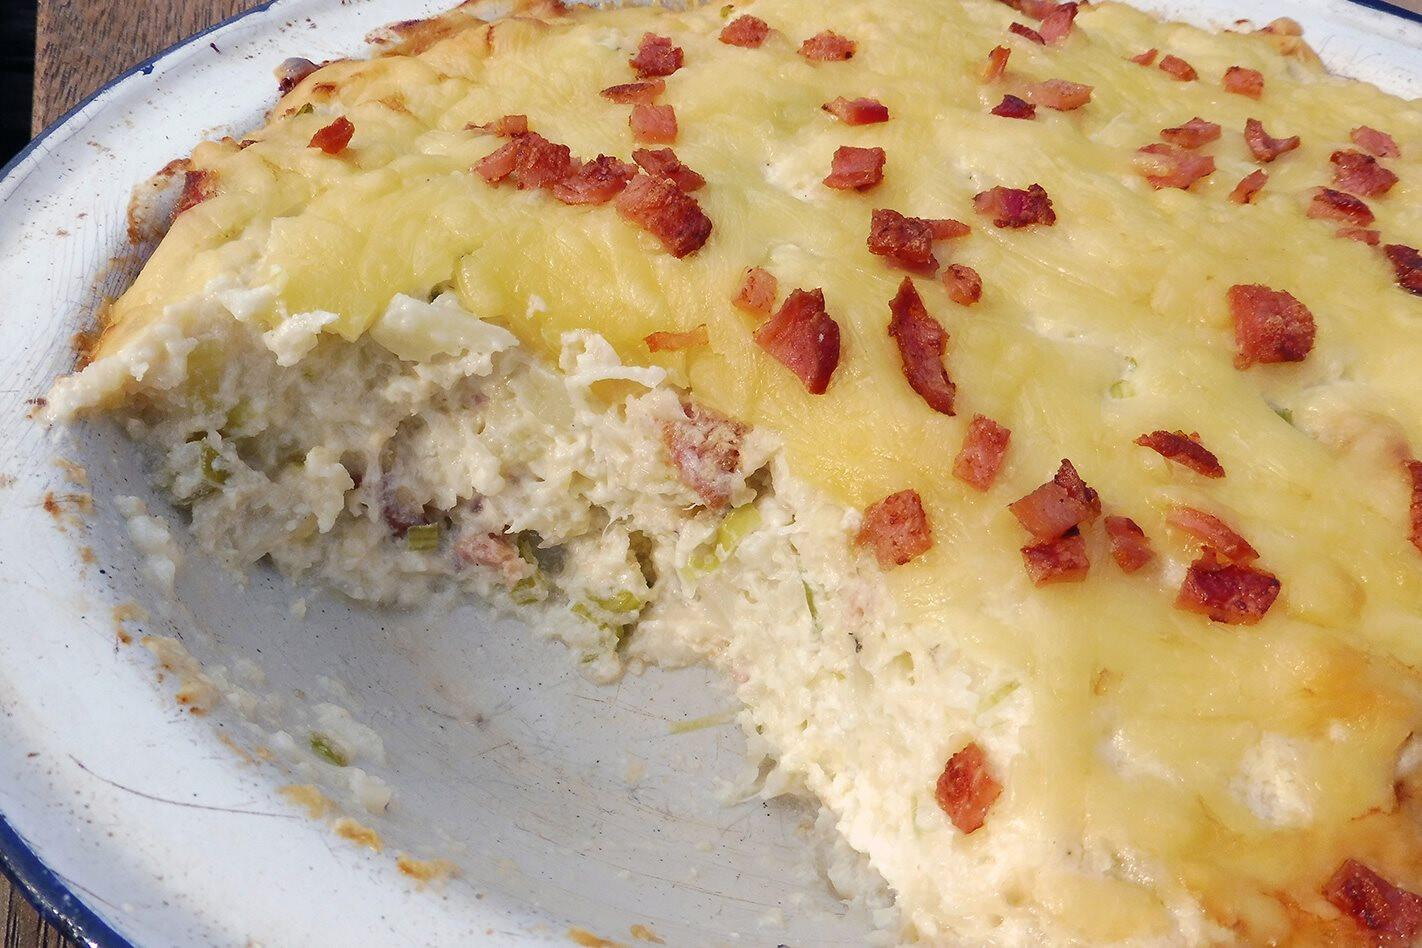 Recipe: Cauliflower, cream cheese and sour cream